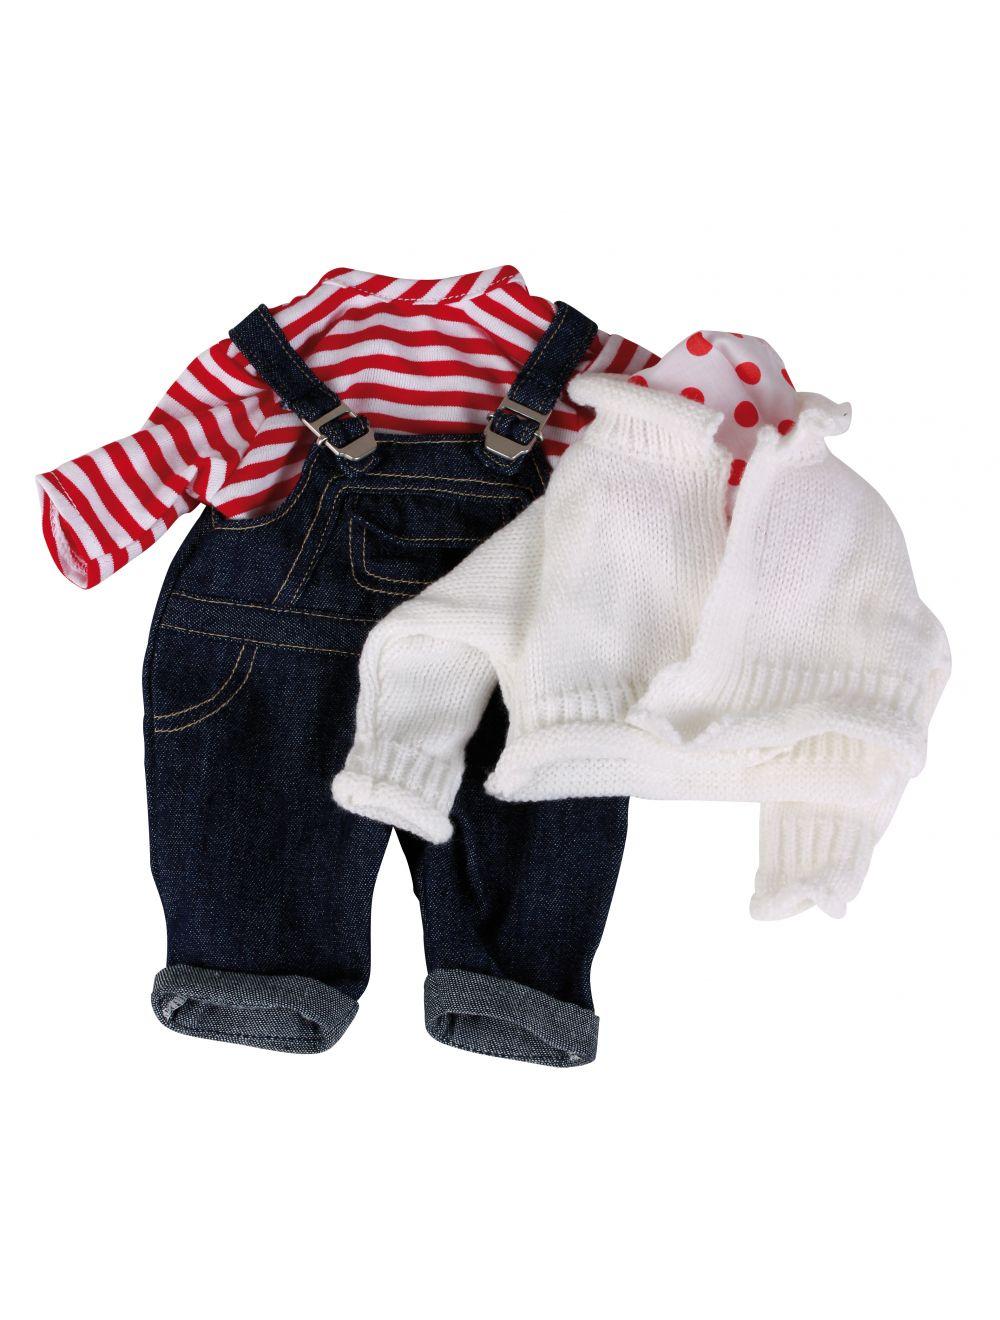 Traksipüksid top kampsun kaelarätik 30-33 cm